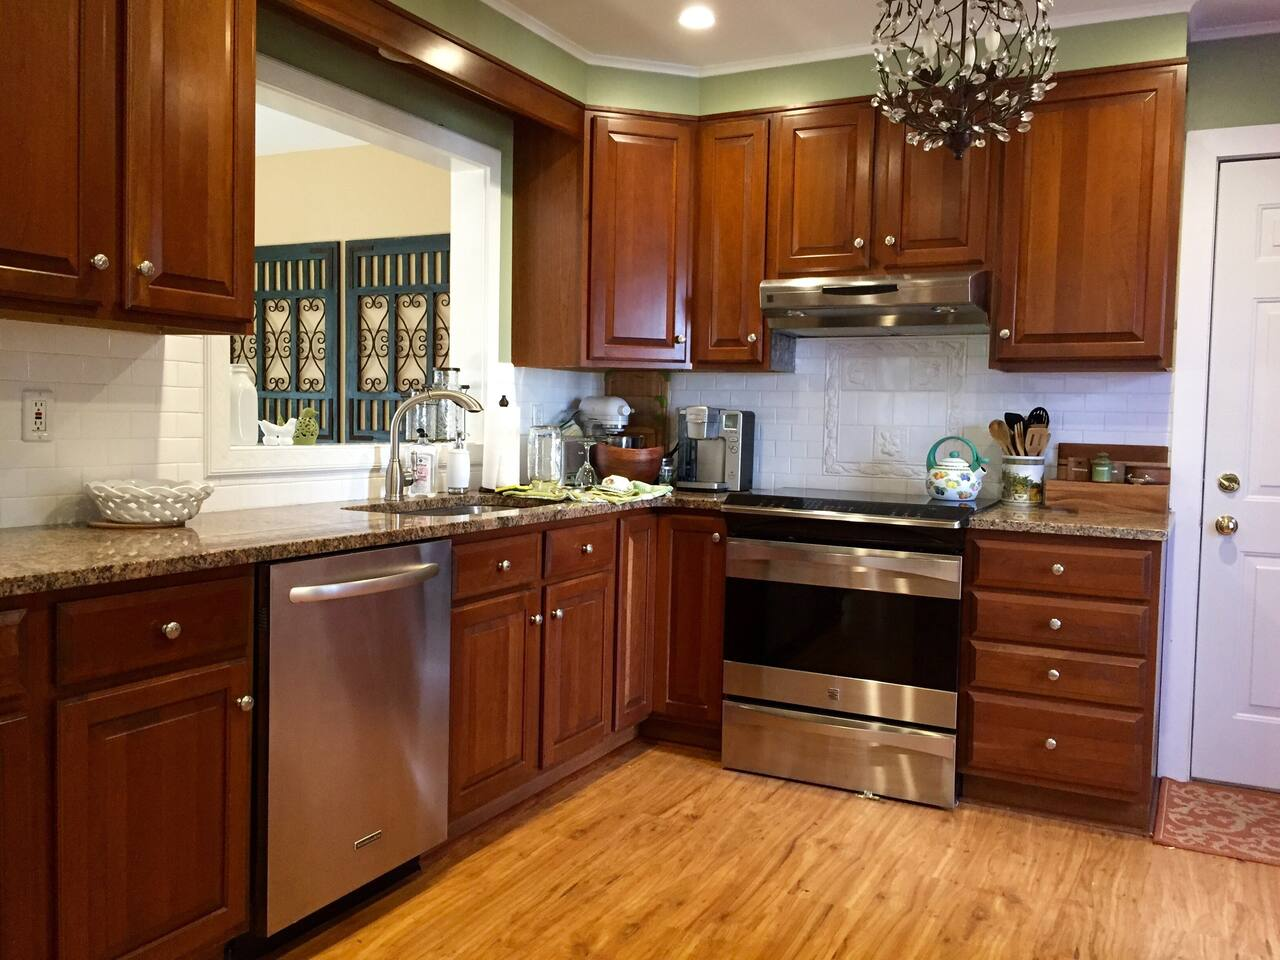 Kitchen- dishwasher, electric range, oven, keurig, kitchen aid mixer !